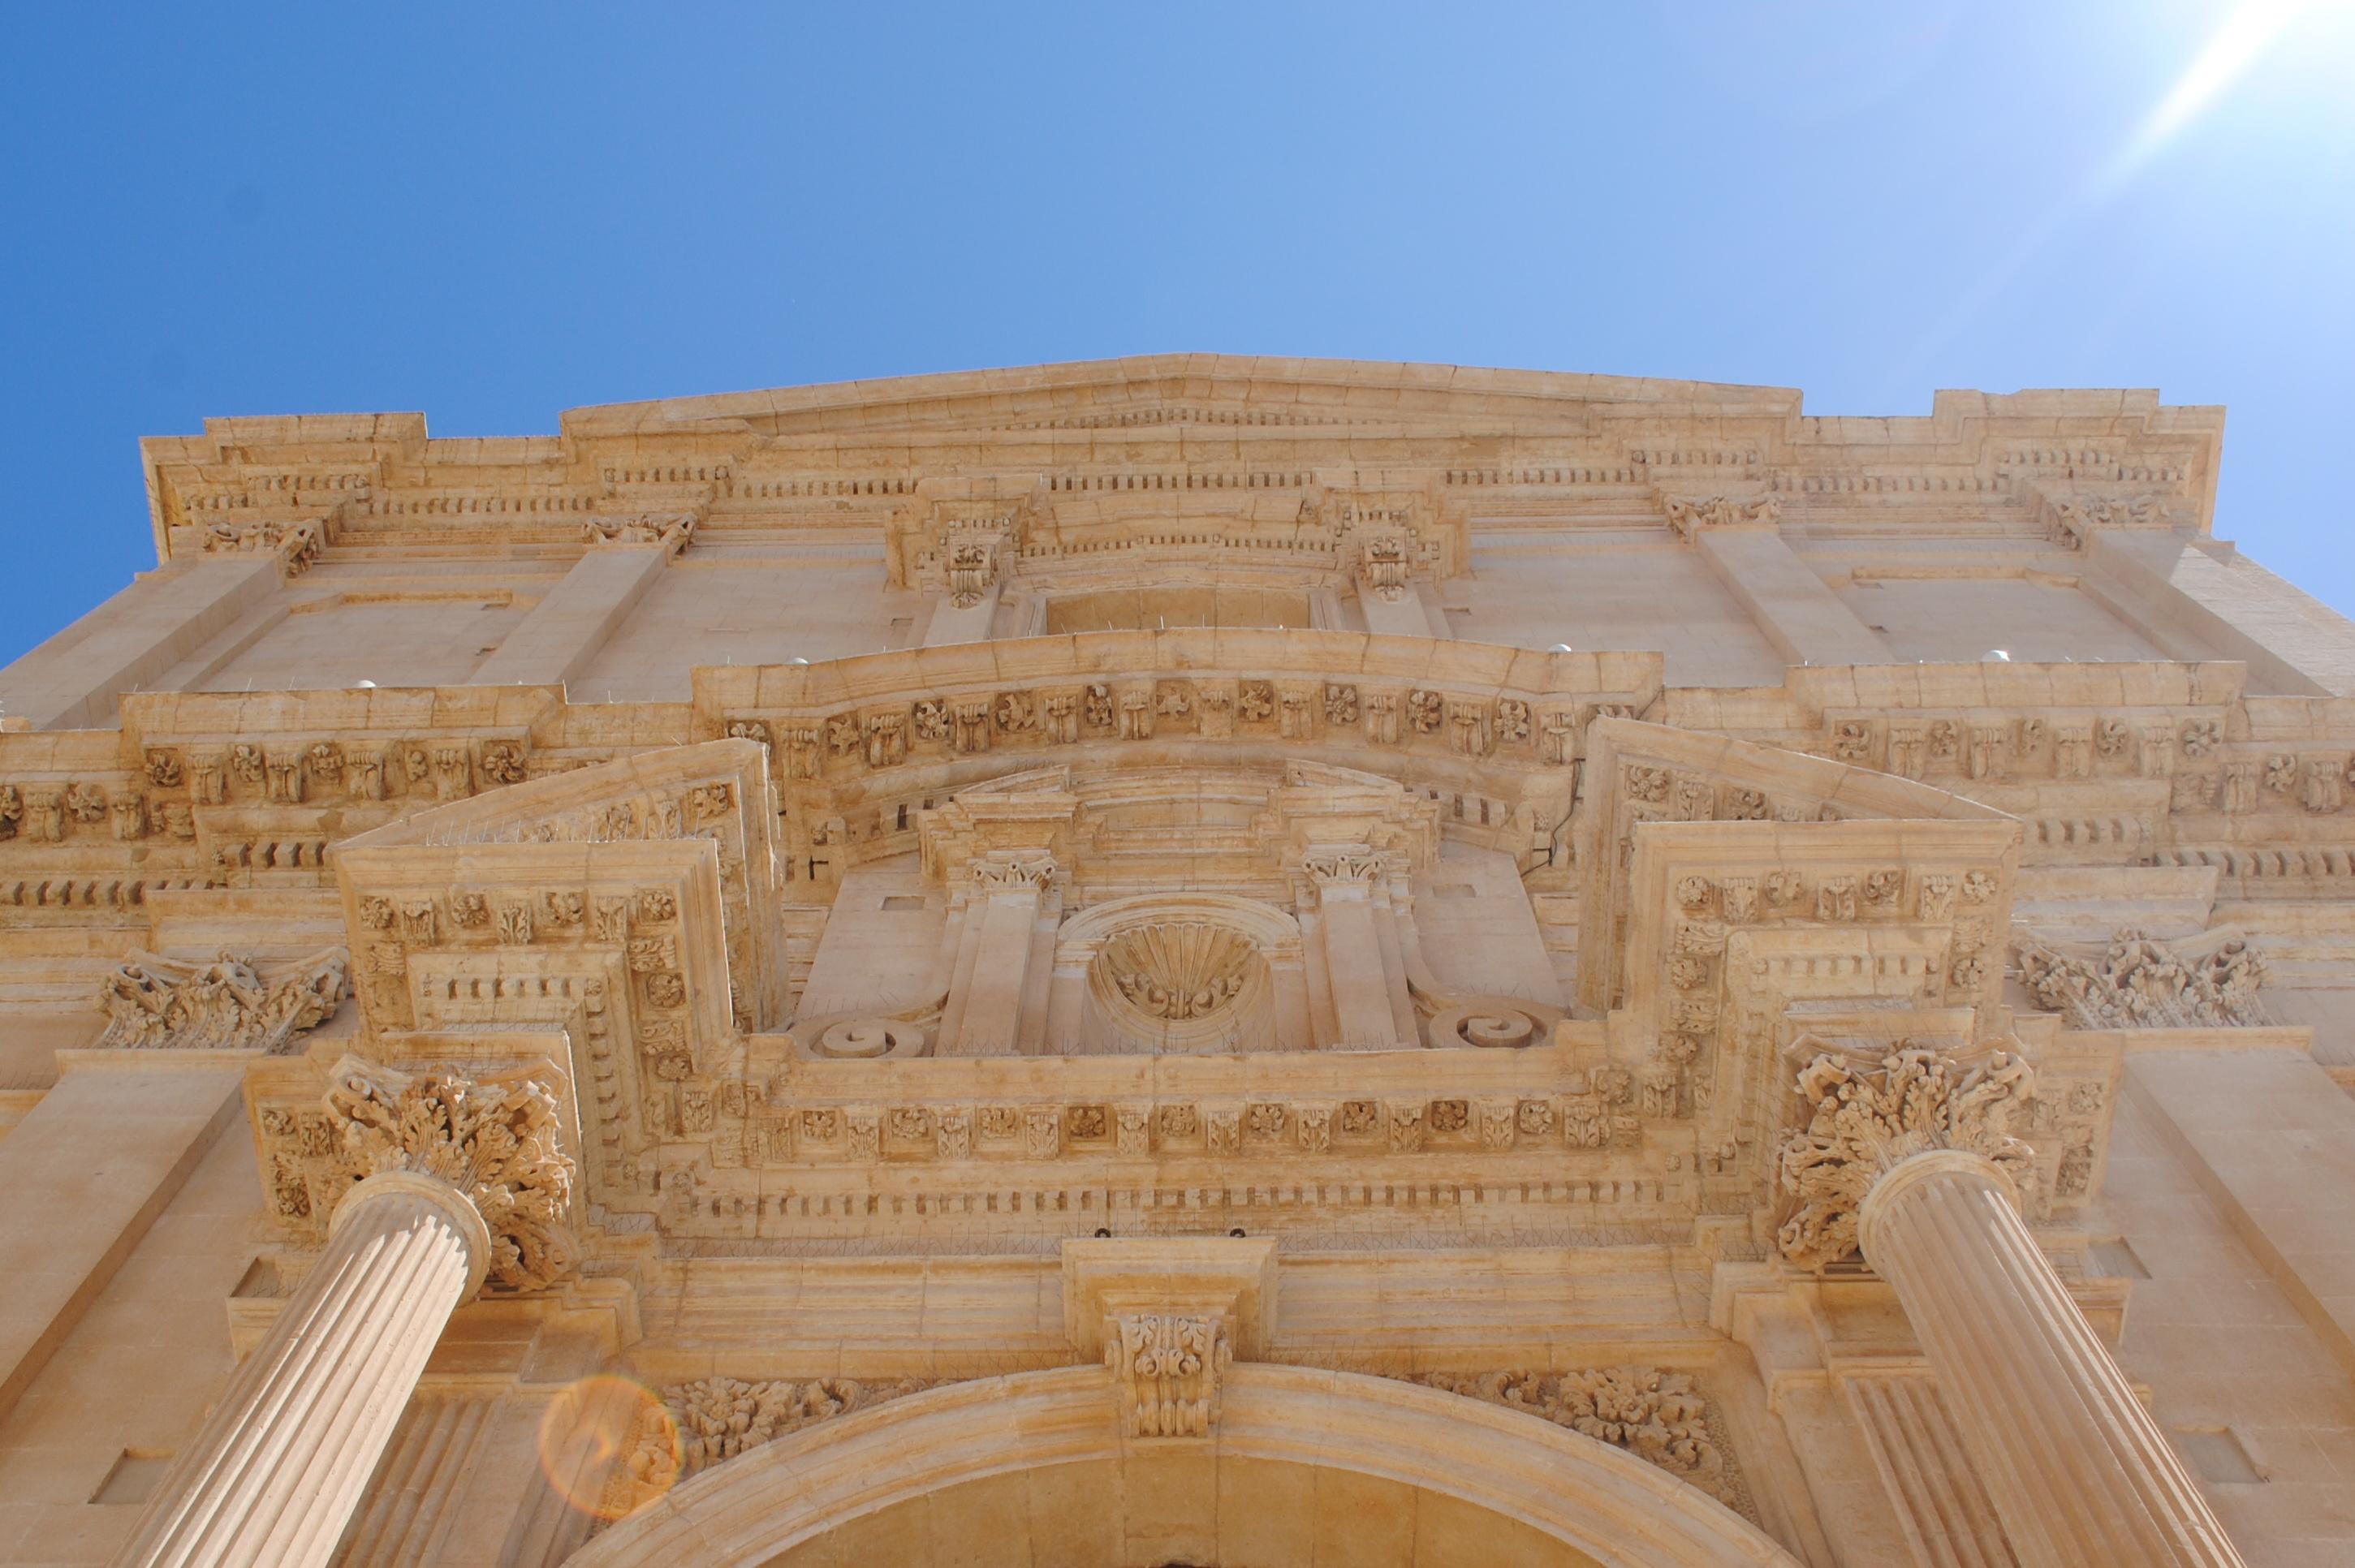 Chiesa San Franceso d'Assisi all'Immacolata